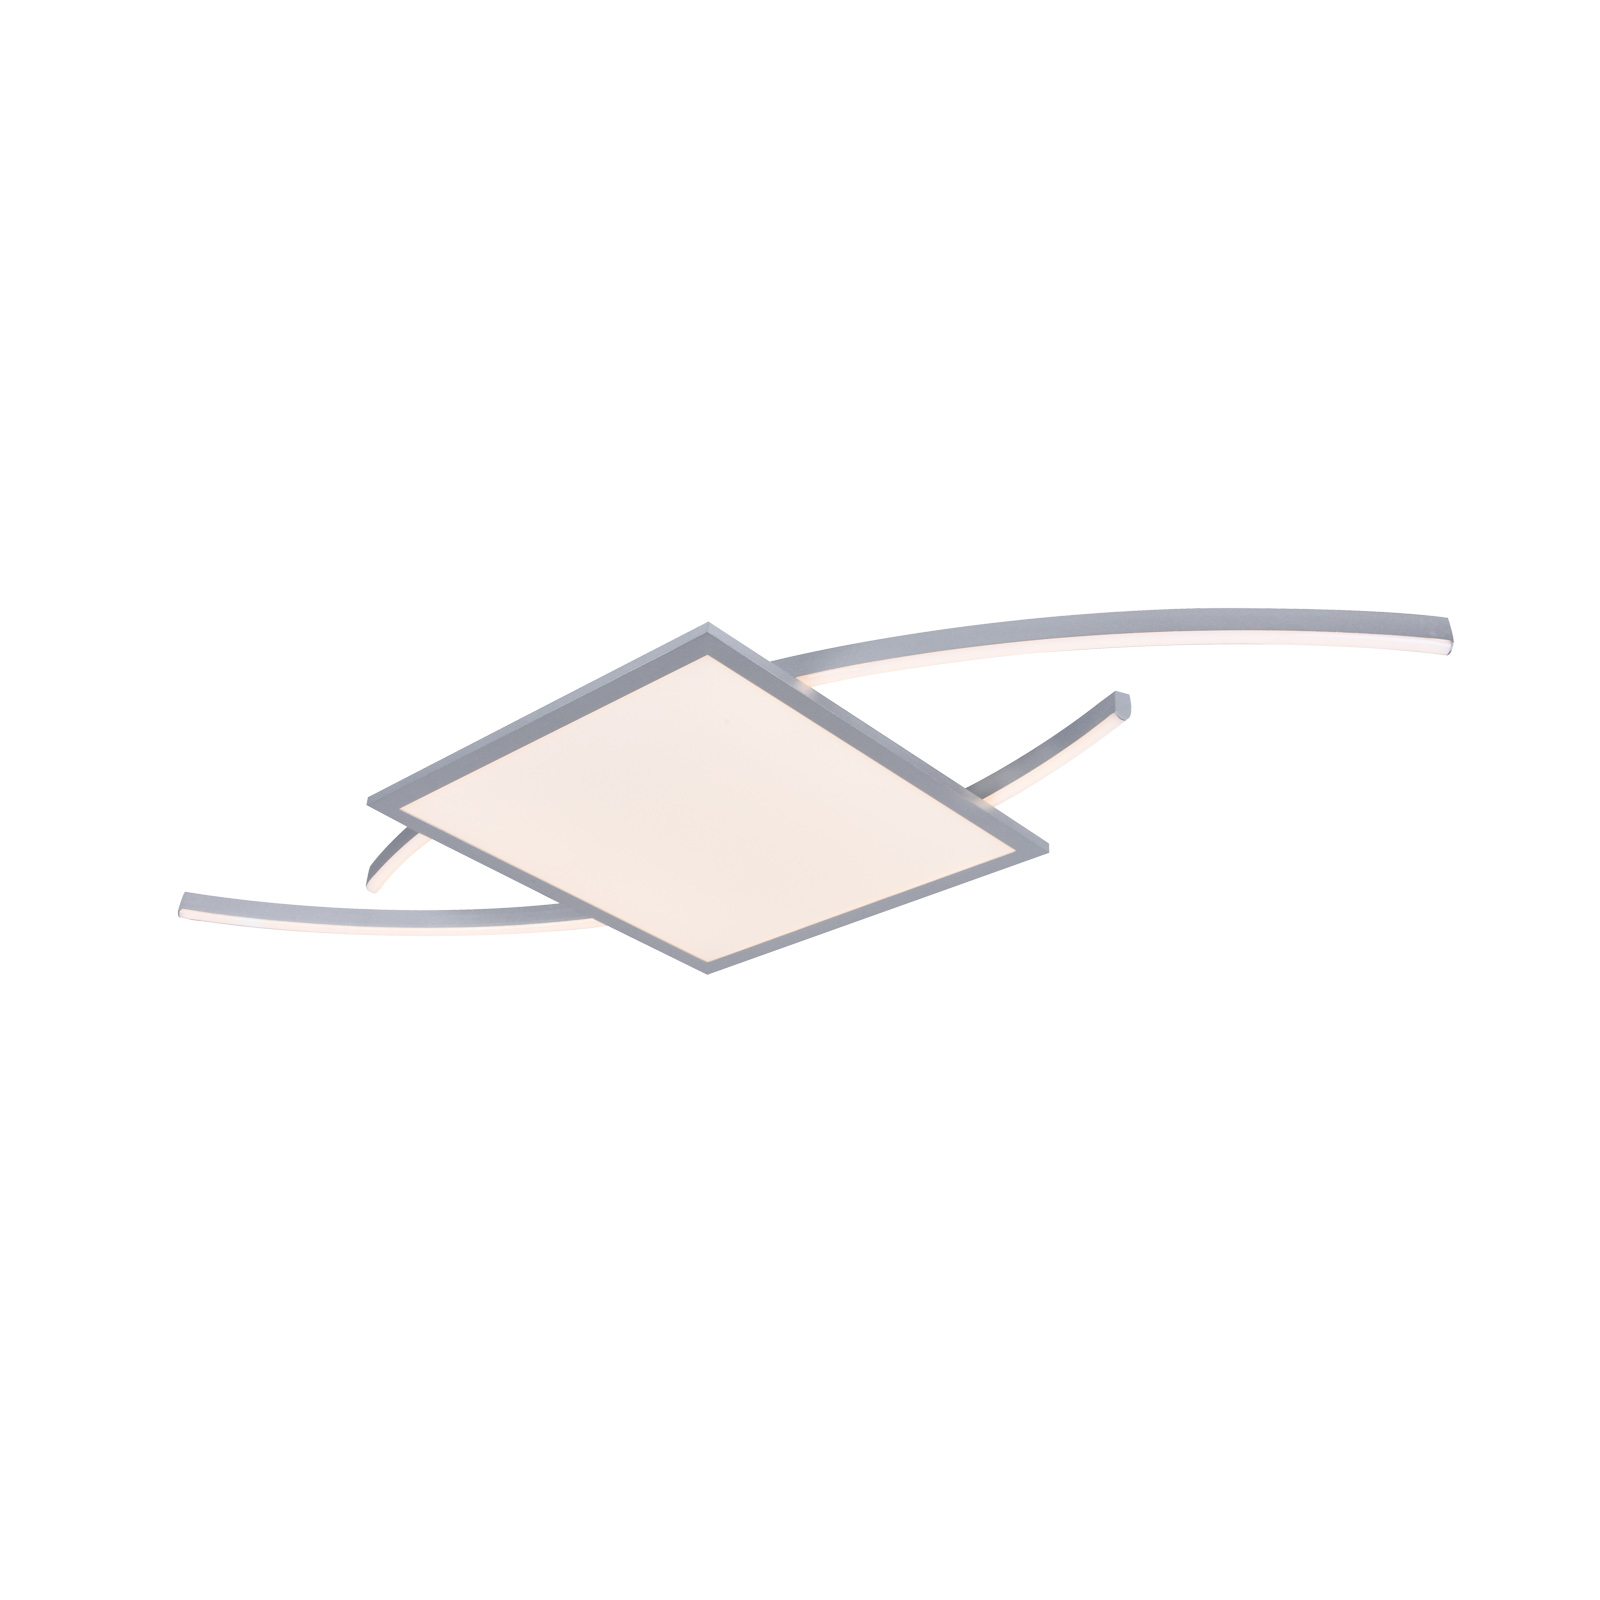 Lucande Tiaro -LED-kattovalaisin, kulmikas 30 cm